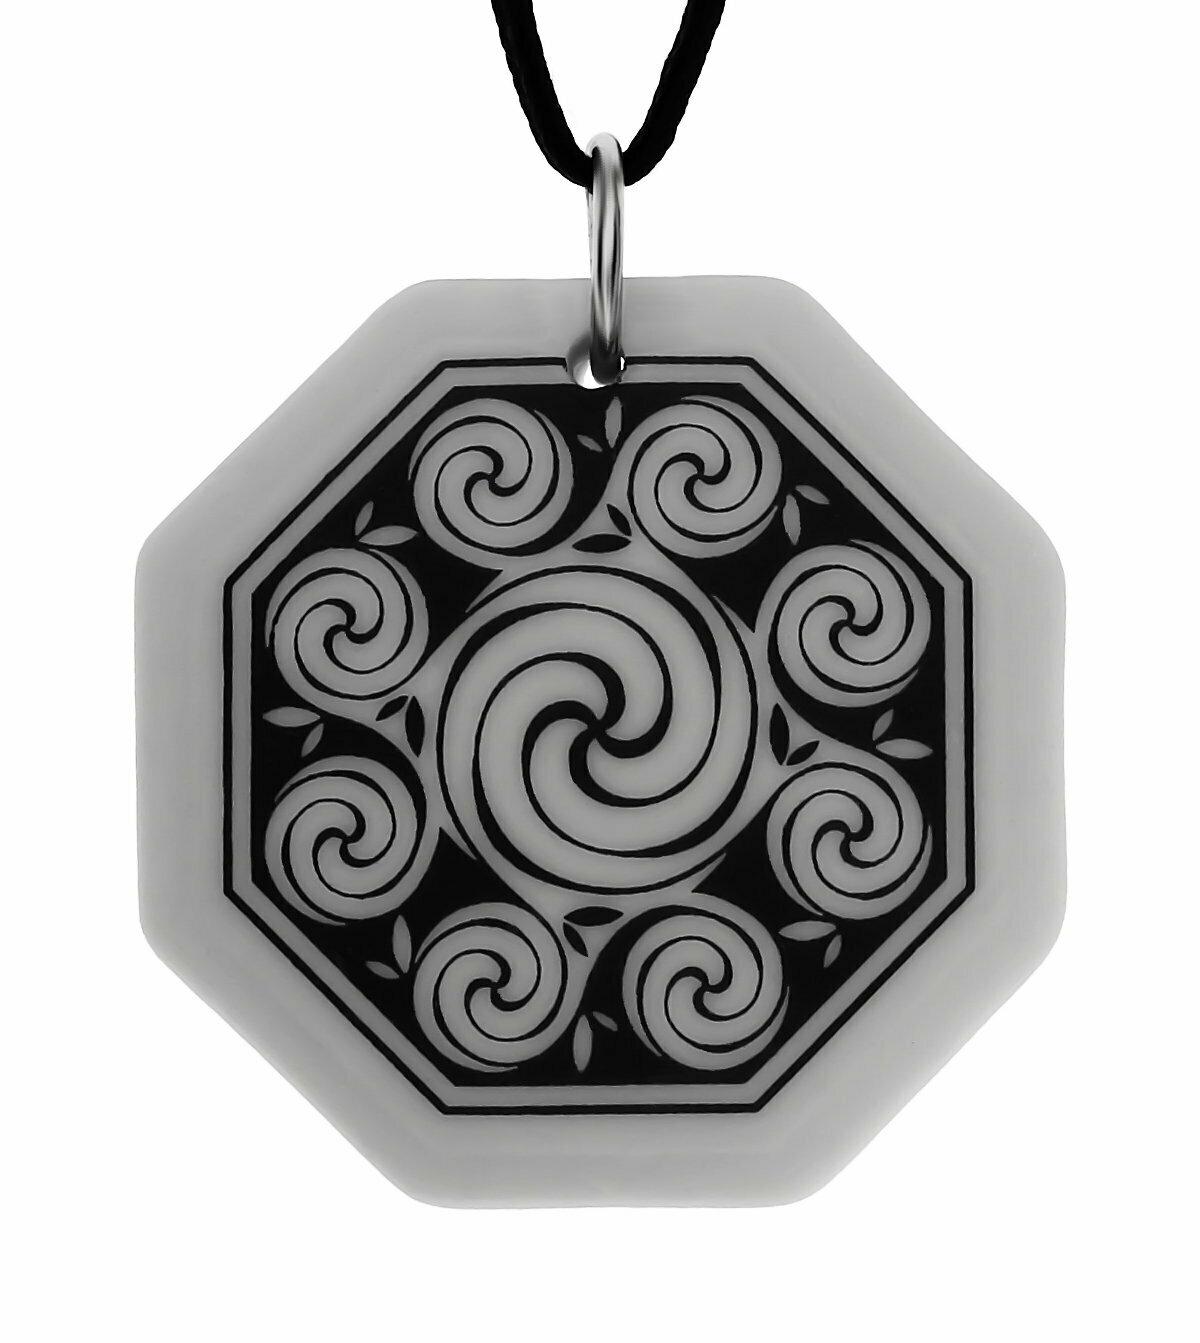 Celtic Spirals Triscele Octagon Handmade Porcelain Pendant